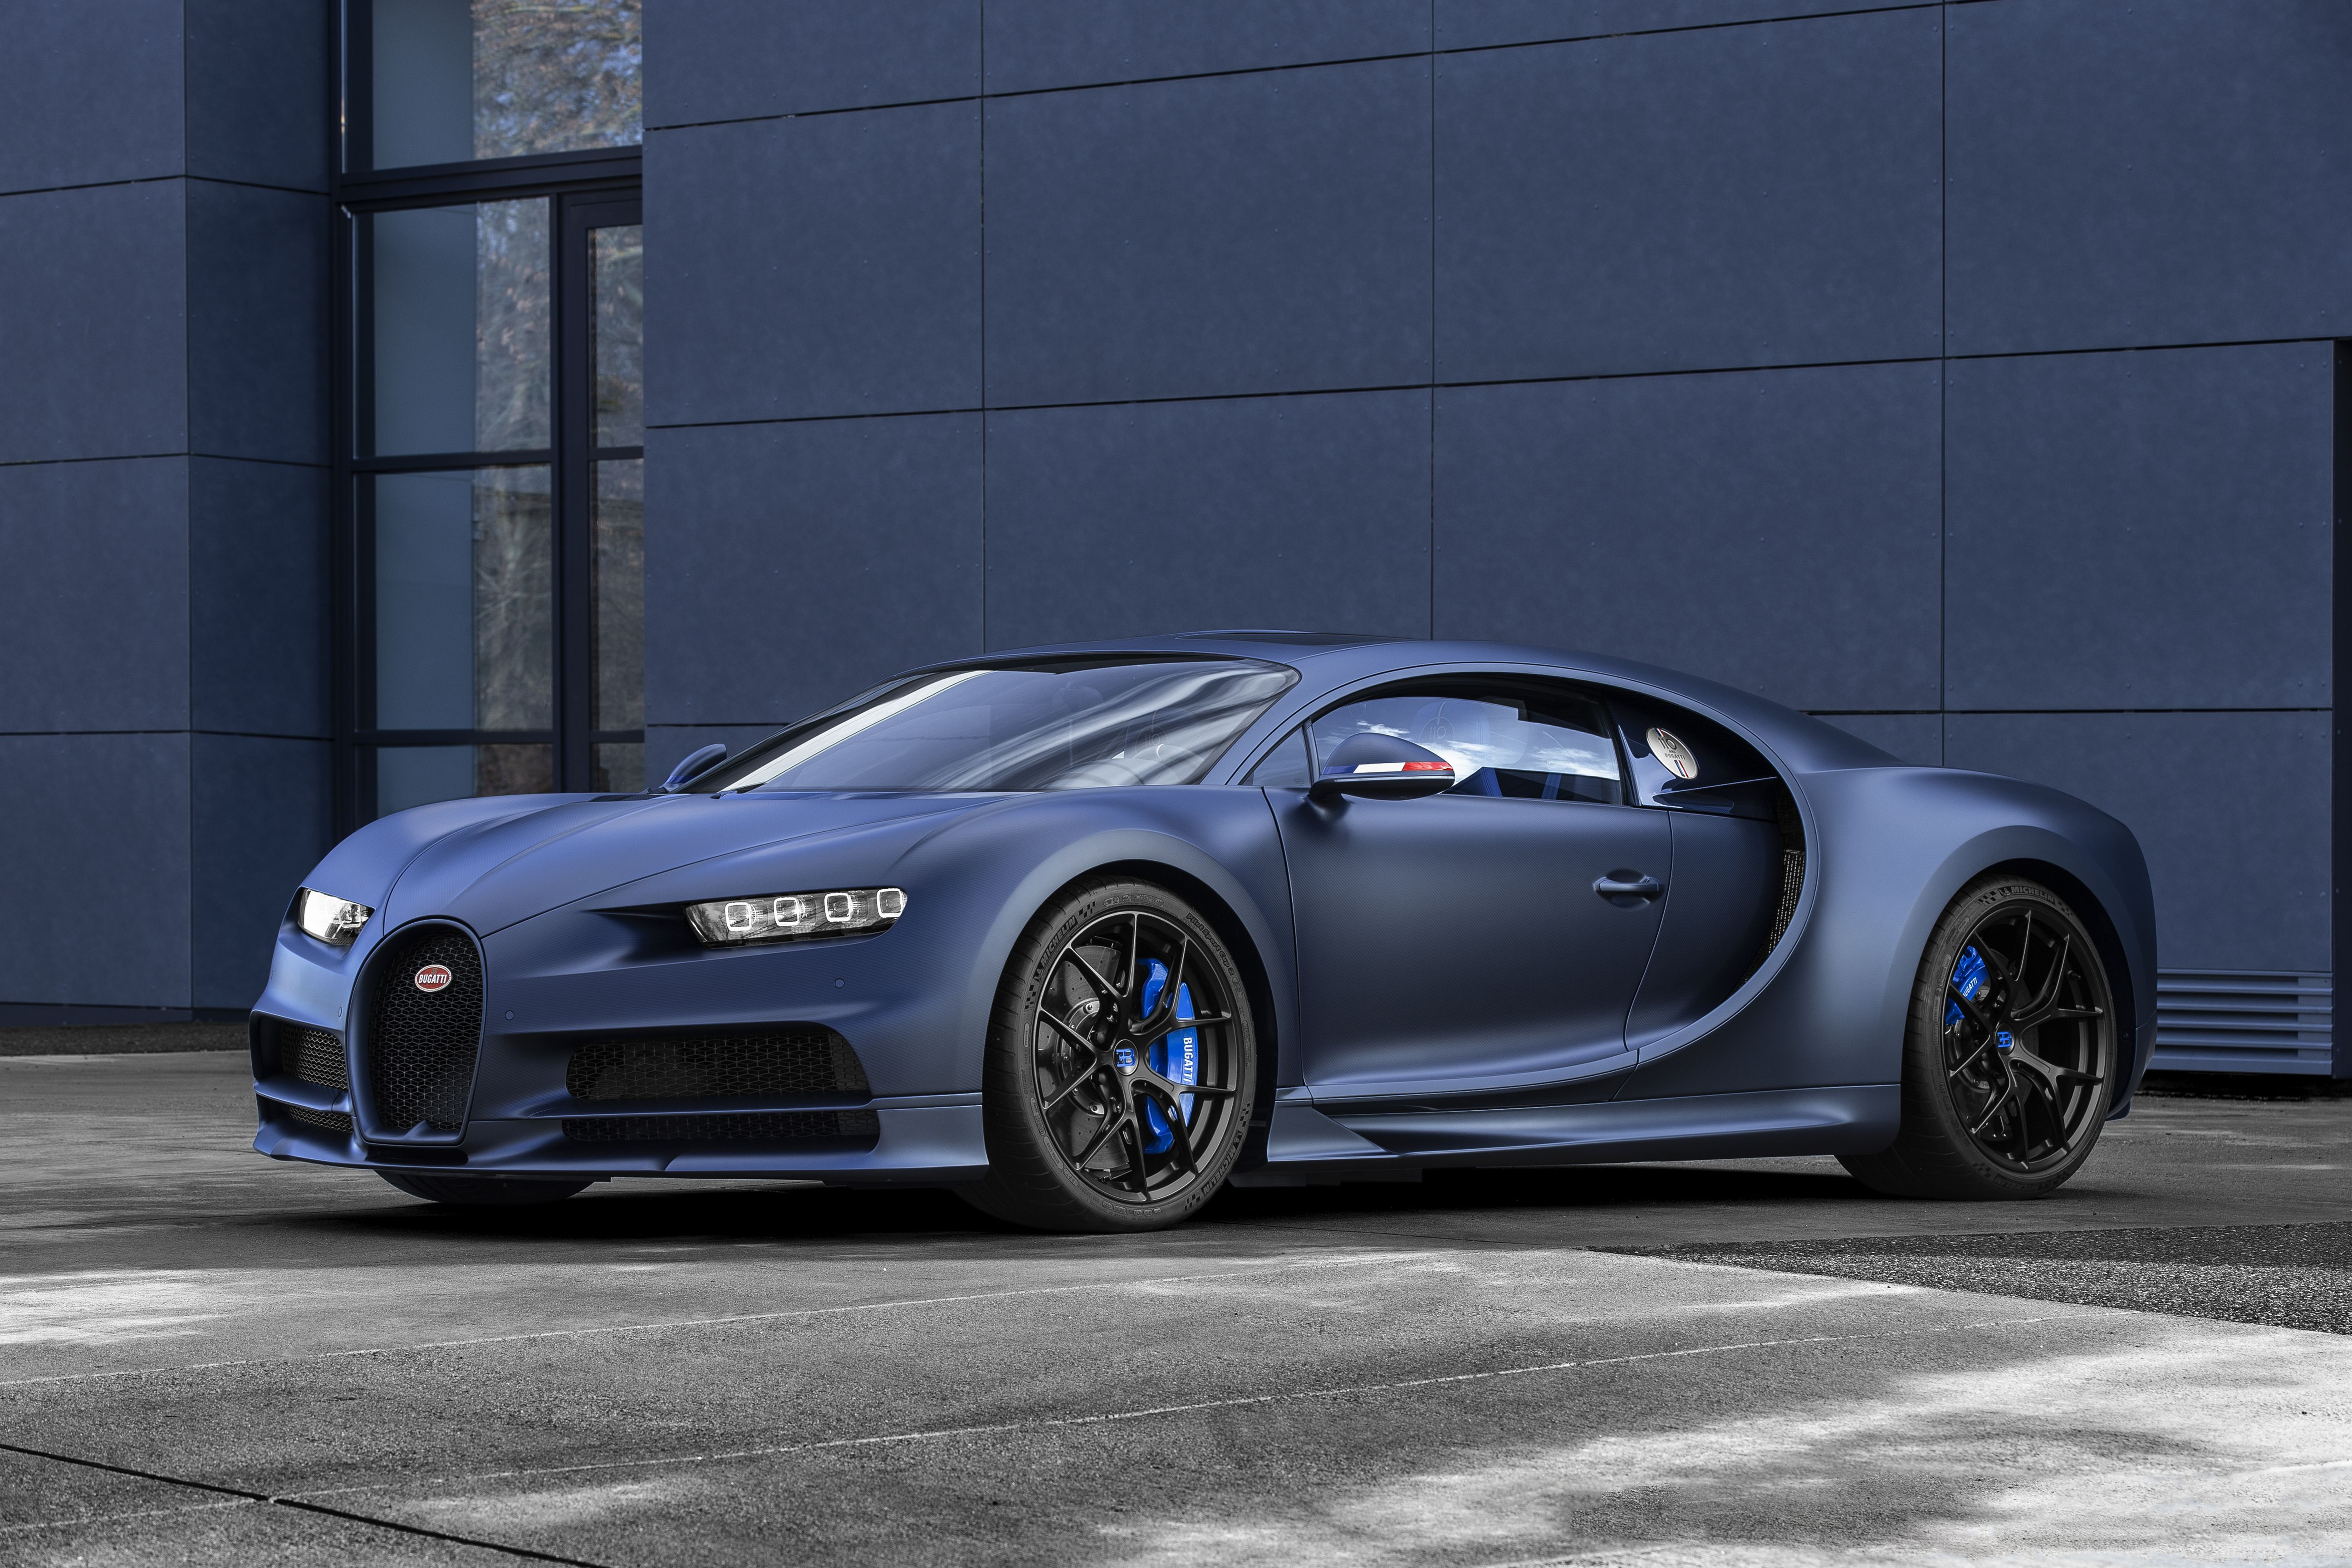 2019 Bugatti Chiron Sport 110 Ans Edition Top Speed Bugatti Cars Bugatti Chiron Bugatti